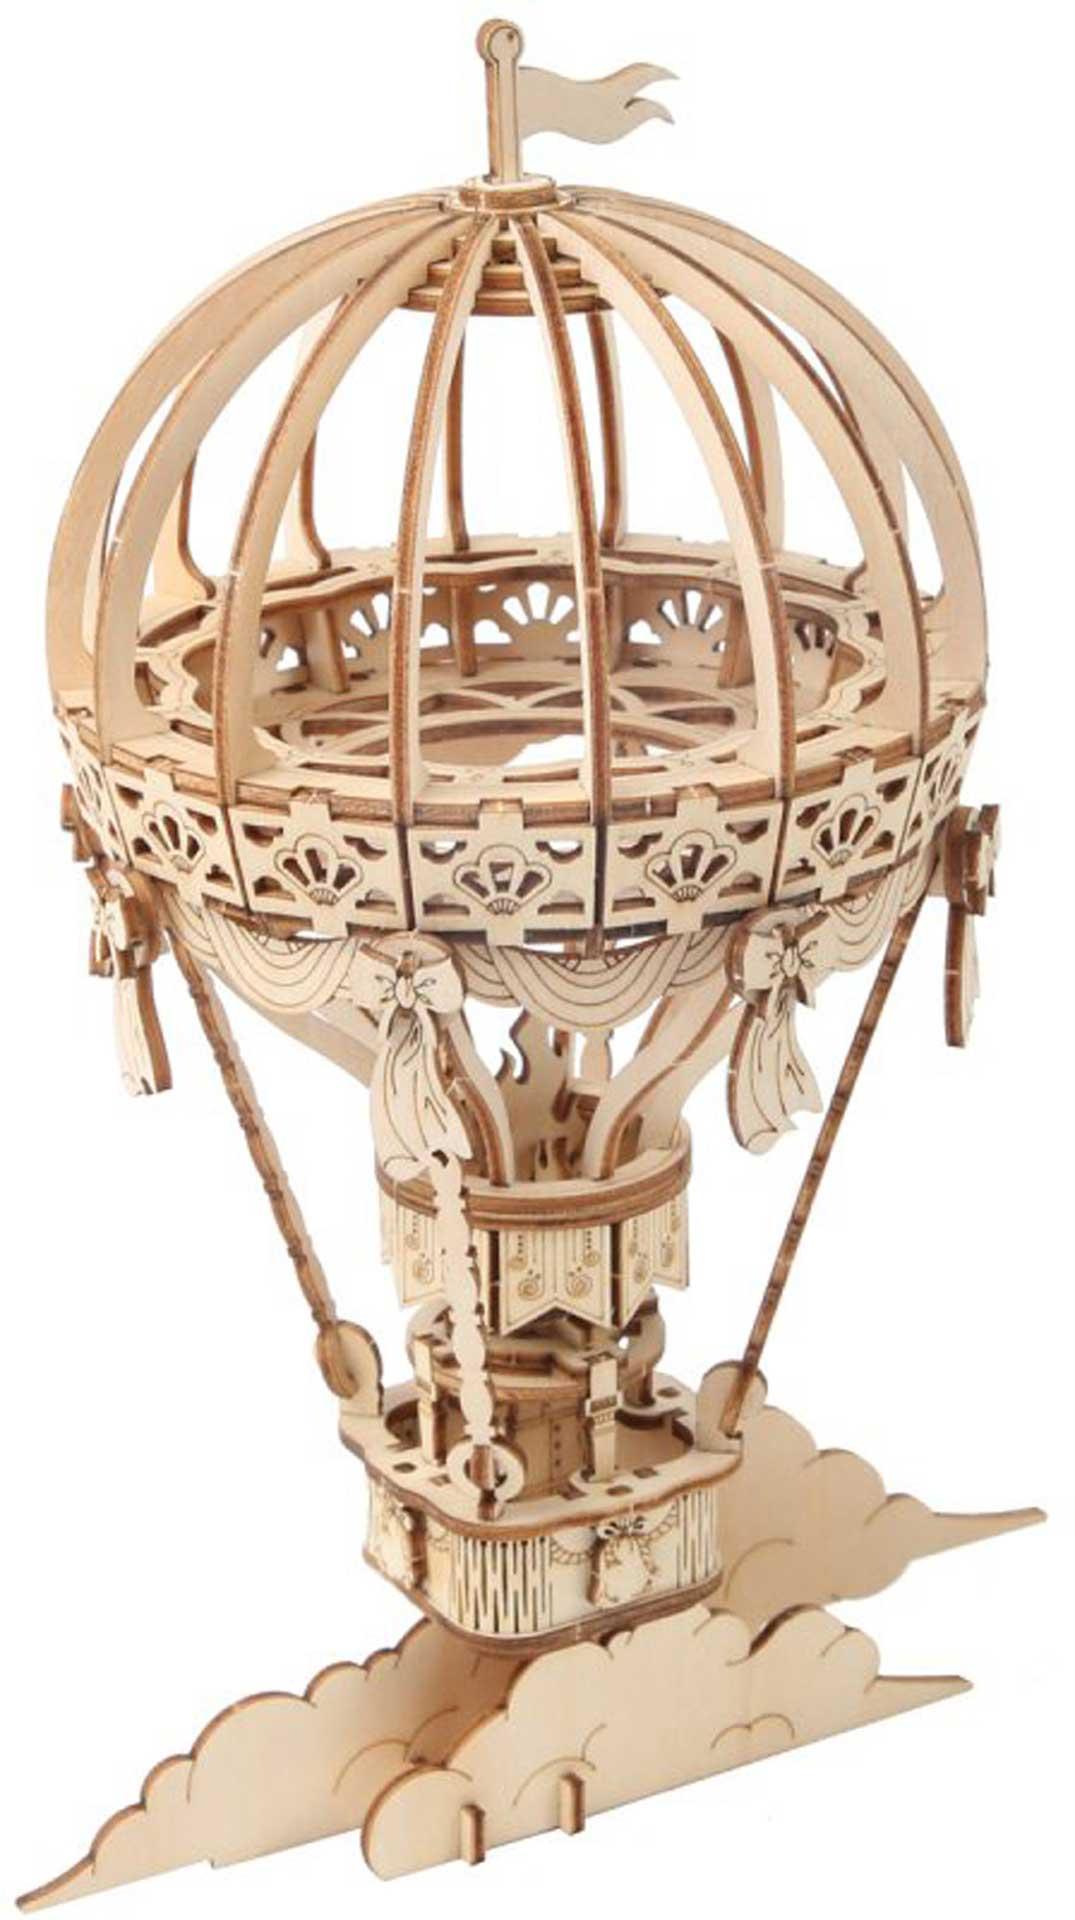 PICHLER Heißluftballon (Lasercut Holzbausatz)